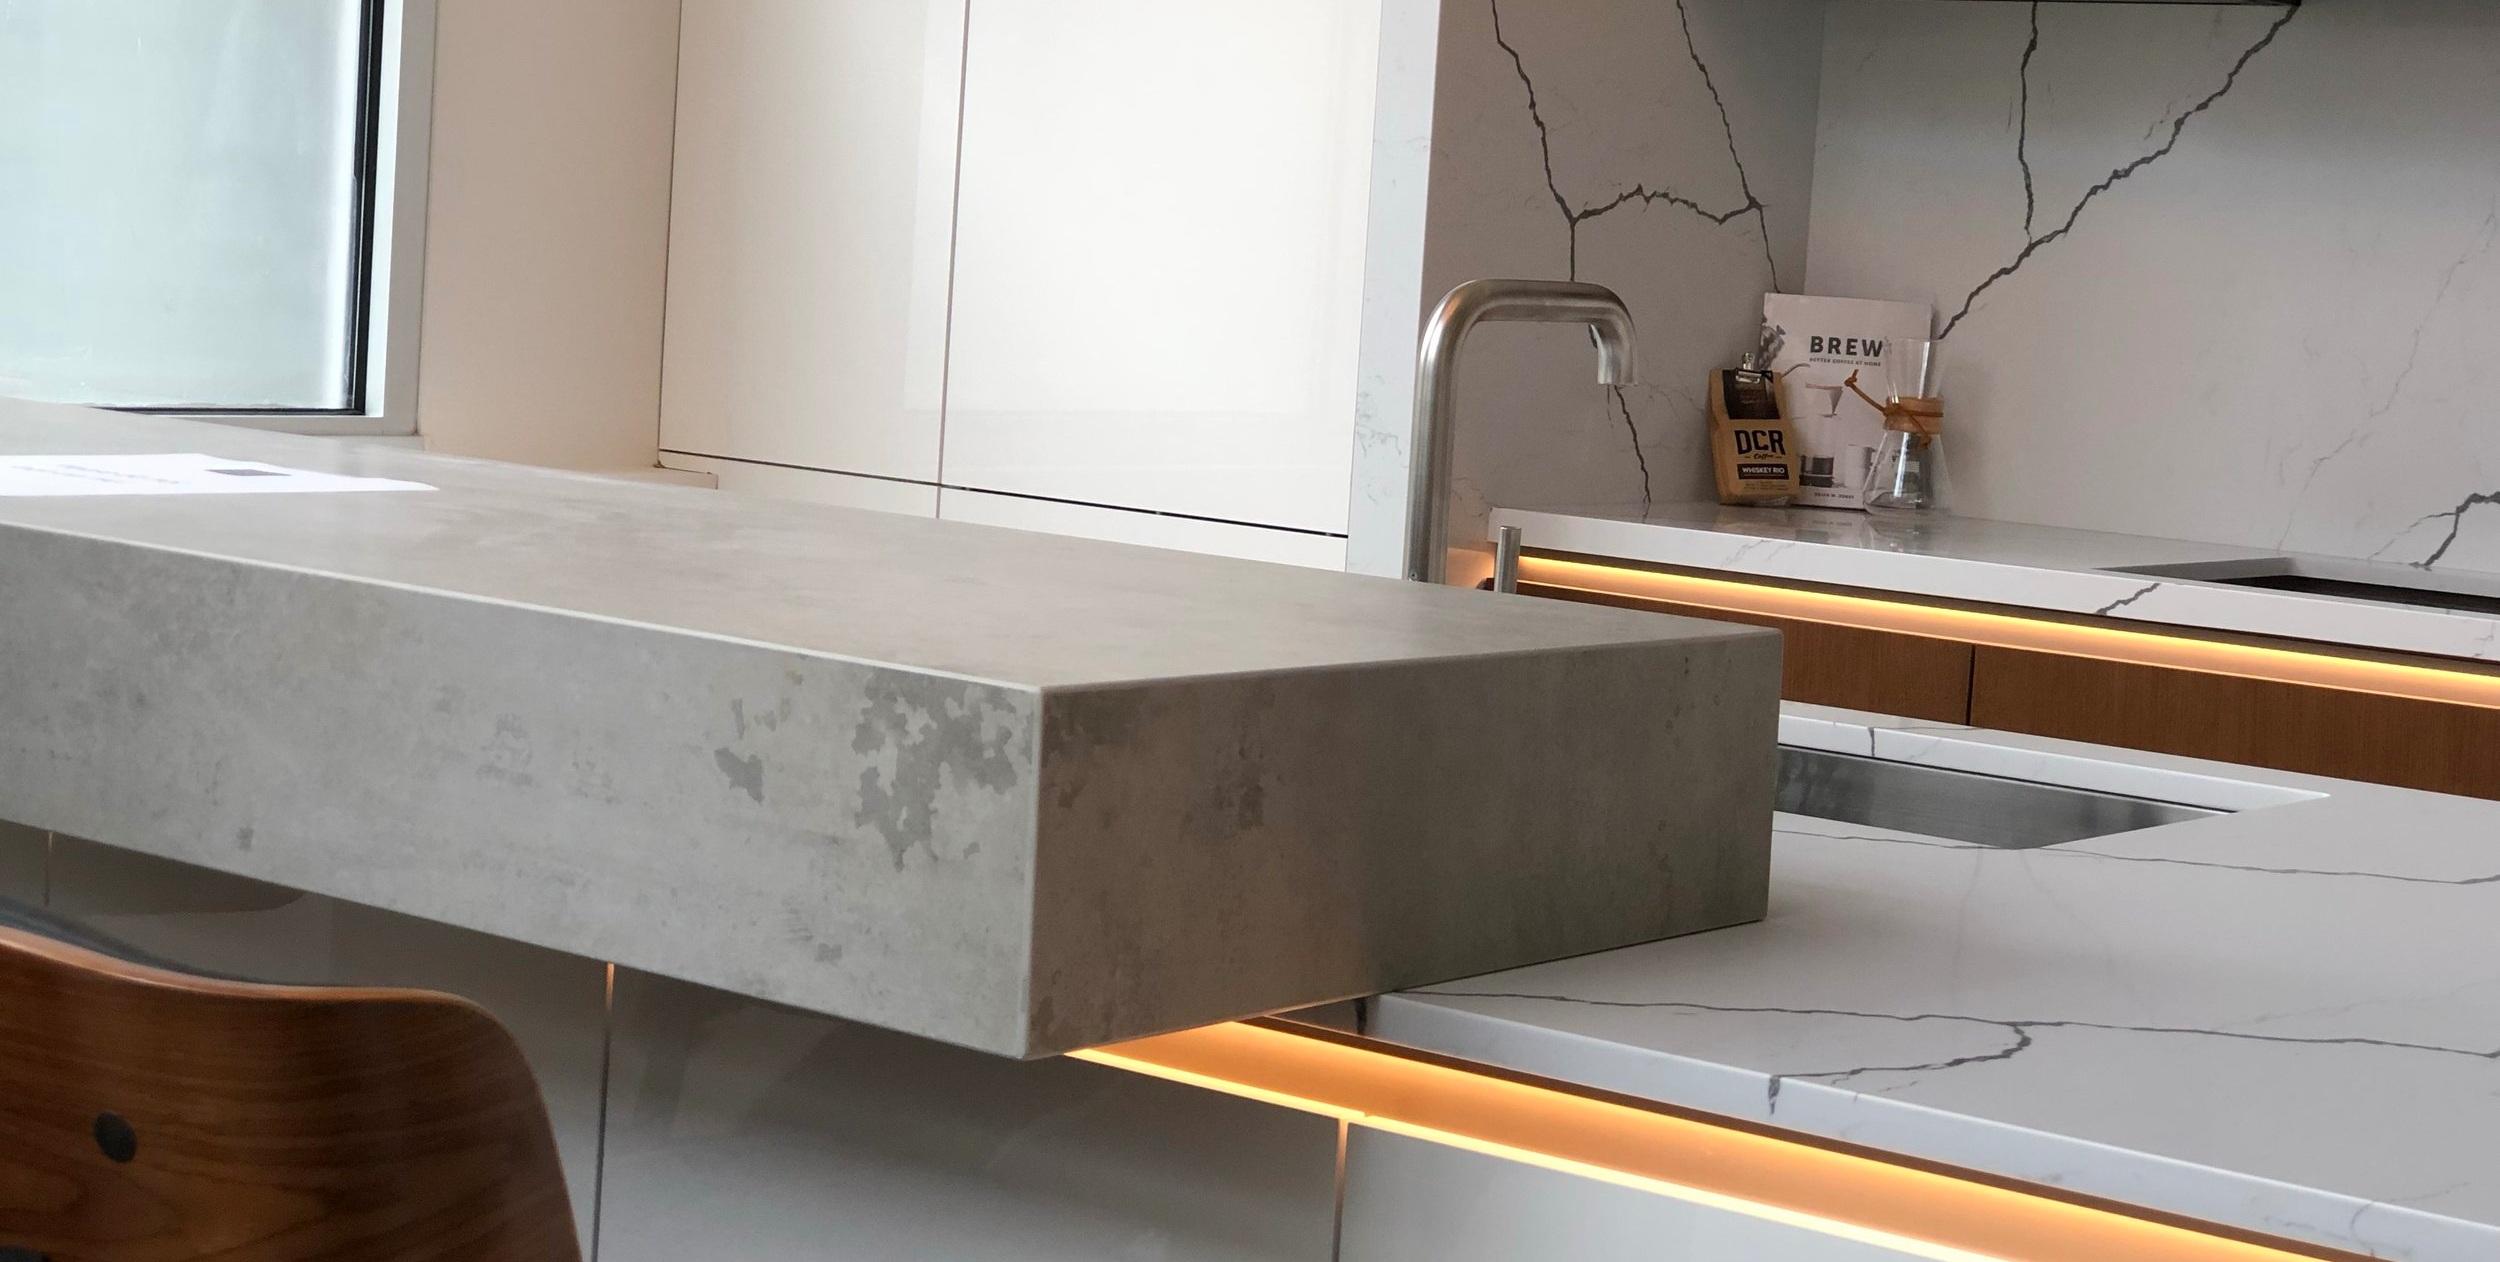 Neolith Sintered Stone - Minimalist Kitchens